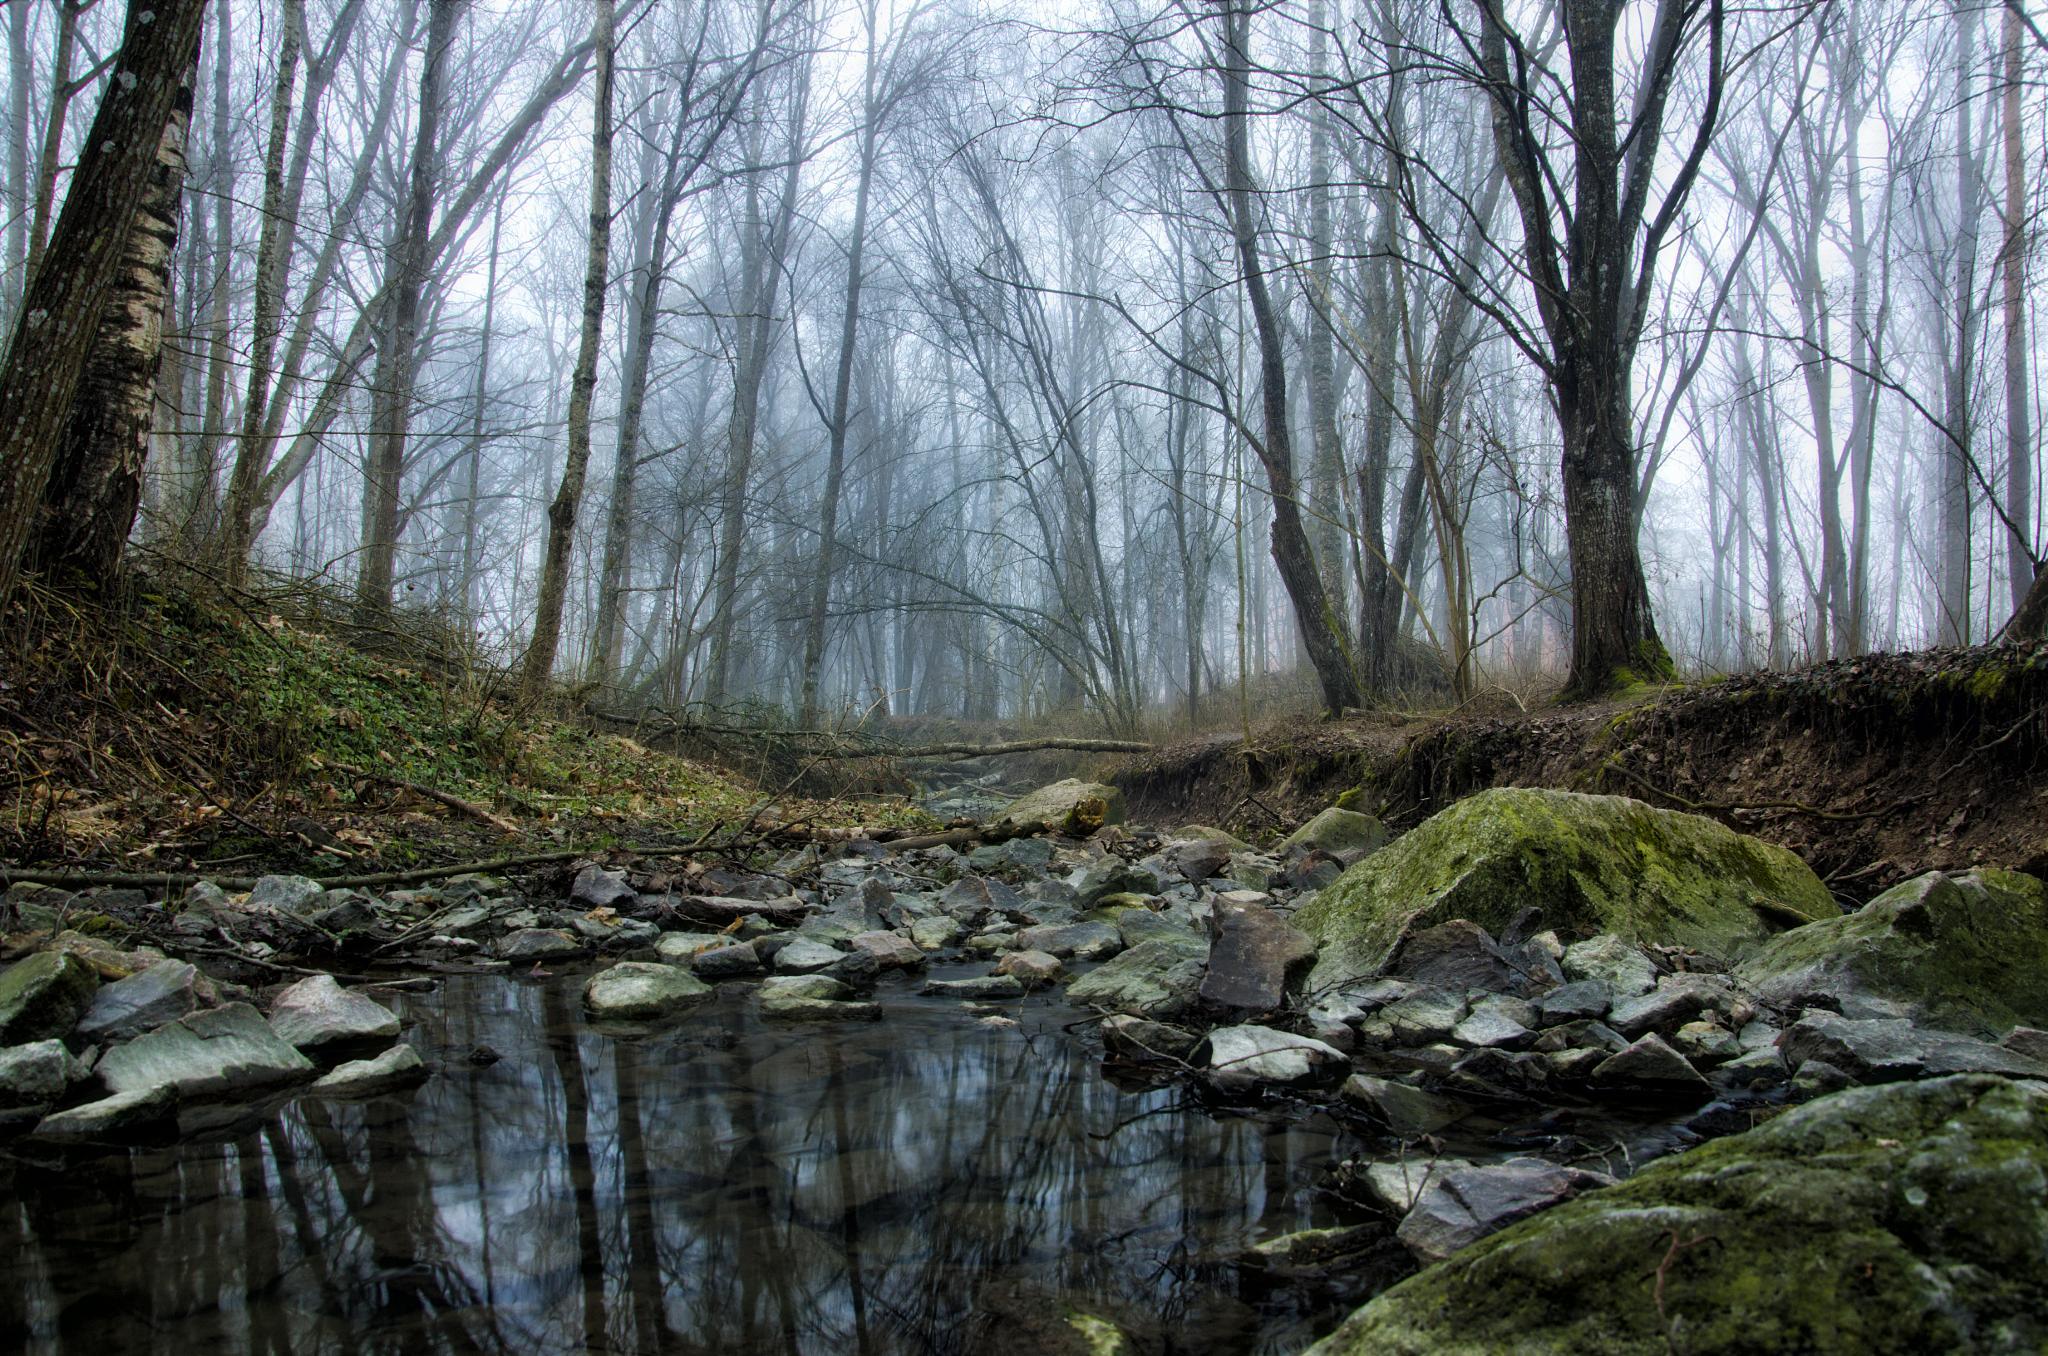 In the misty forest by Alexander Arntsen